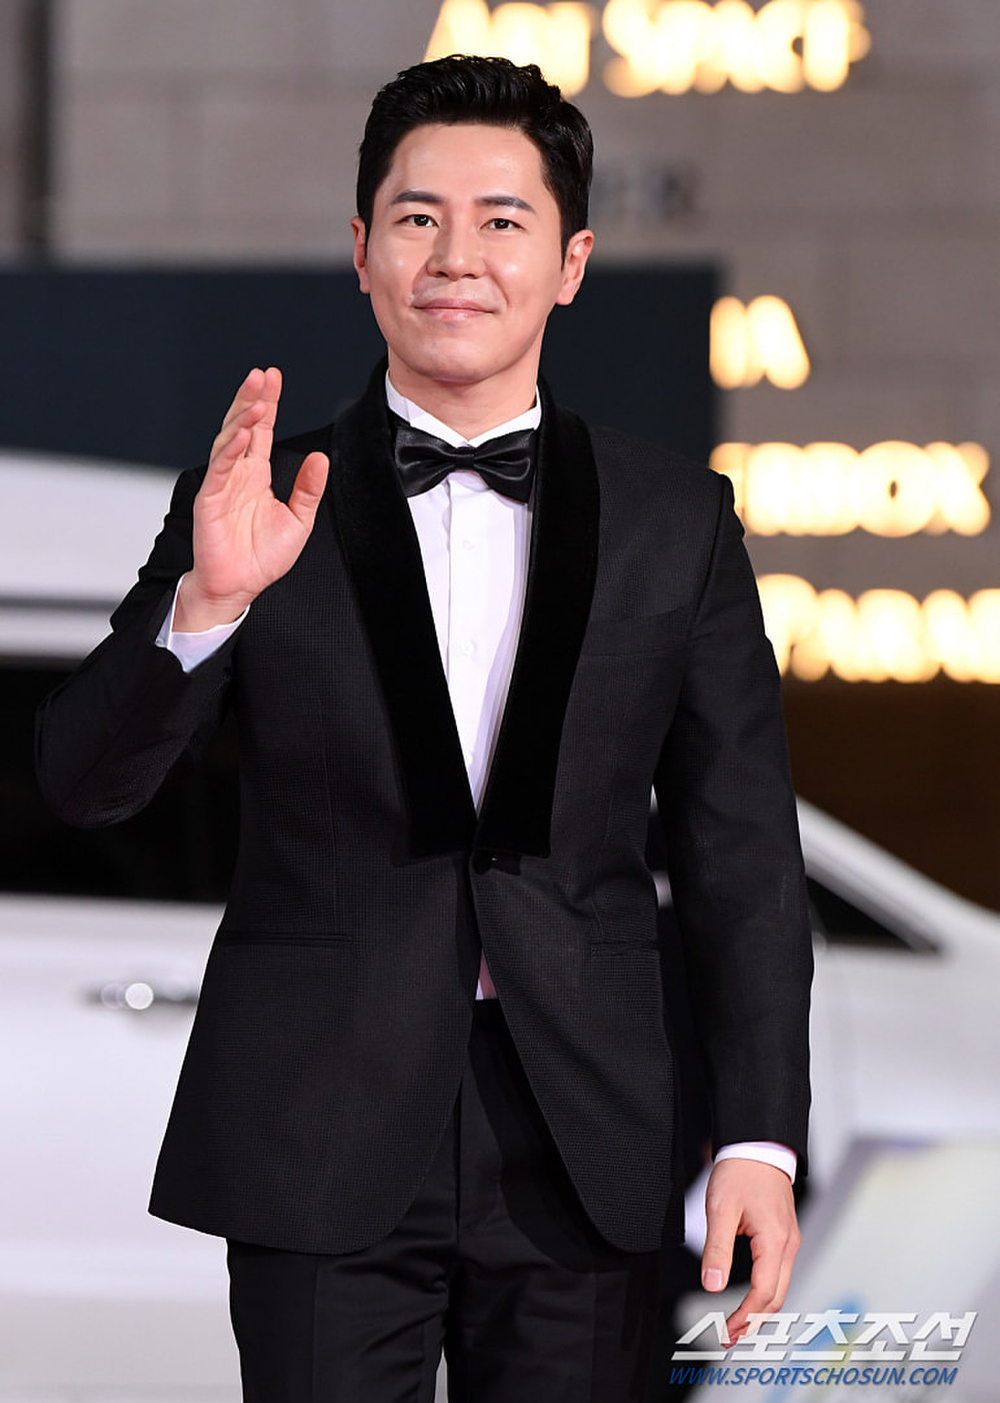 Thảm đỏ 'Rồng xanh 2020': Shin Hye Sun 'cân sắc' Shin Min Ah, Jung Woo Sung - Lee Byung Hun điển trai! Ảnh 38